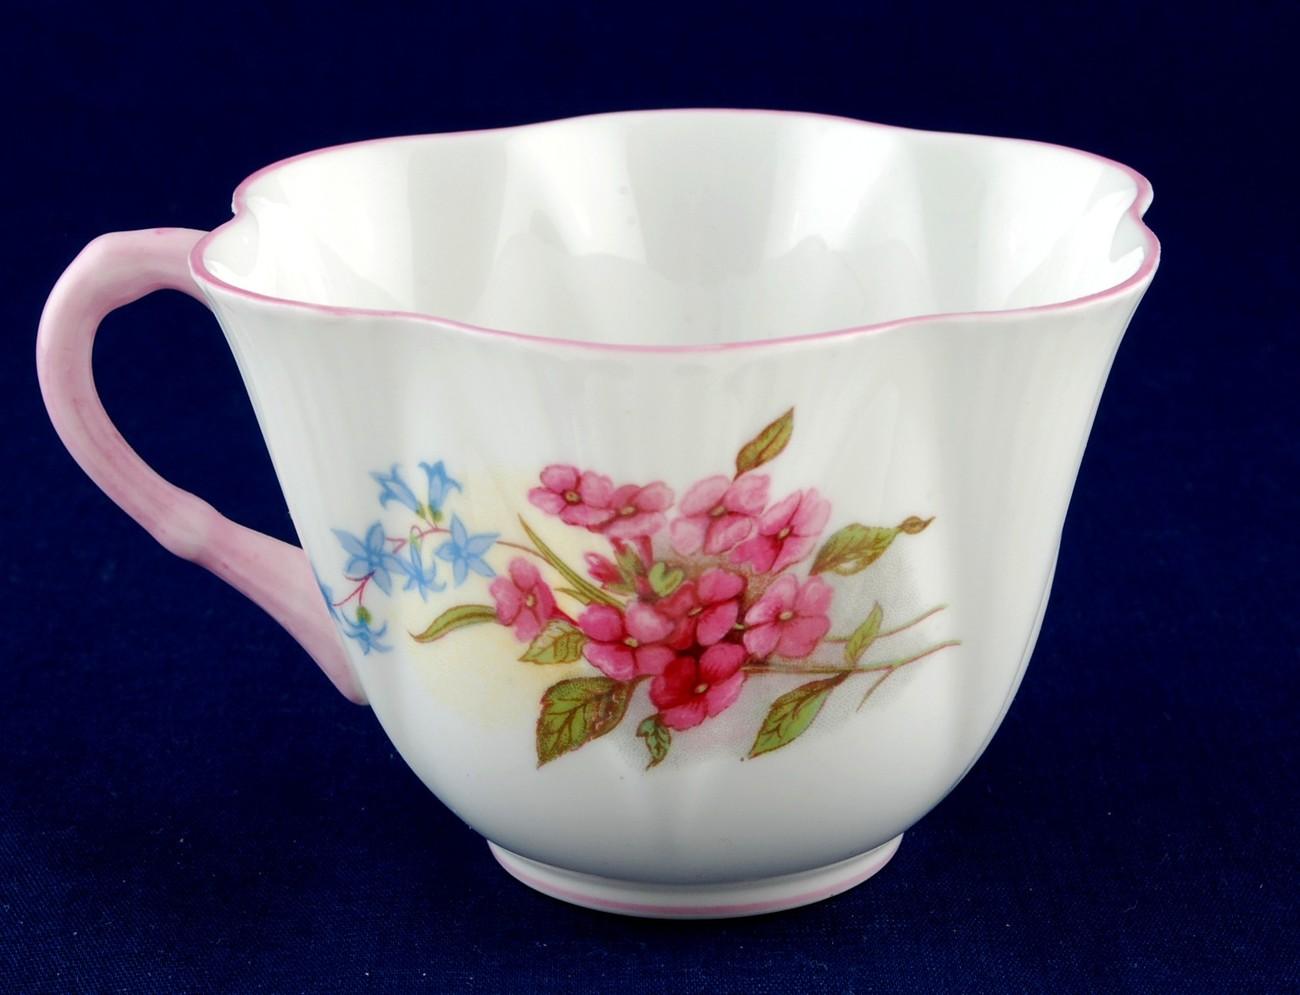 Shelley Stocks Cup Dainty Shape Pink Rim / Handle 13428 Mint